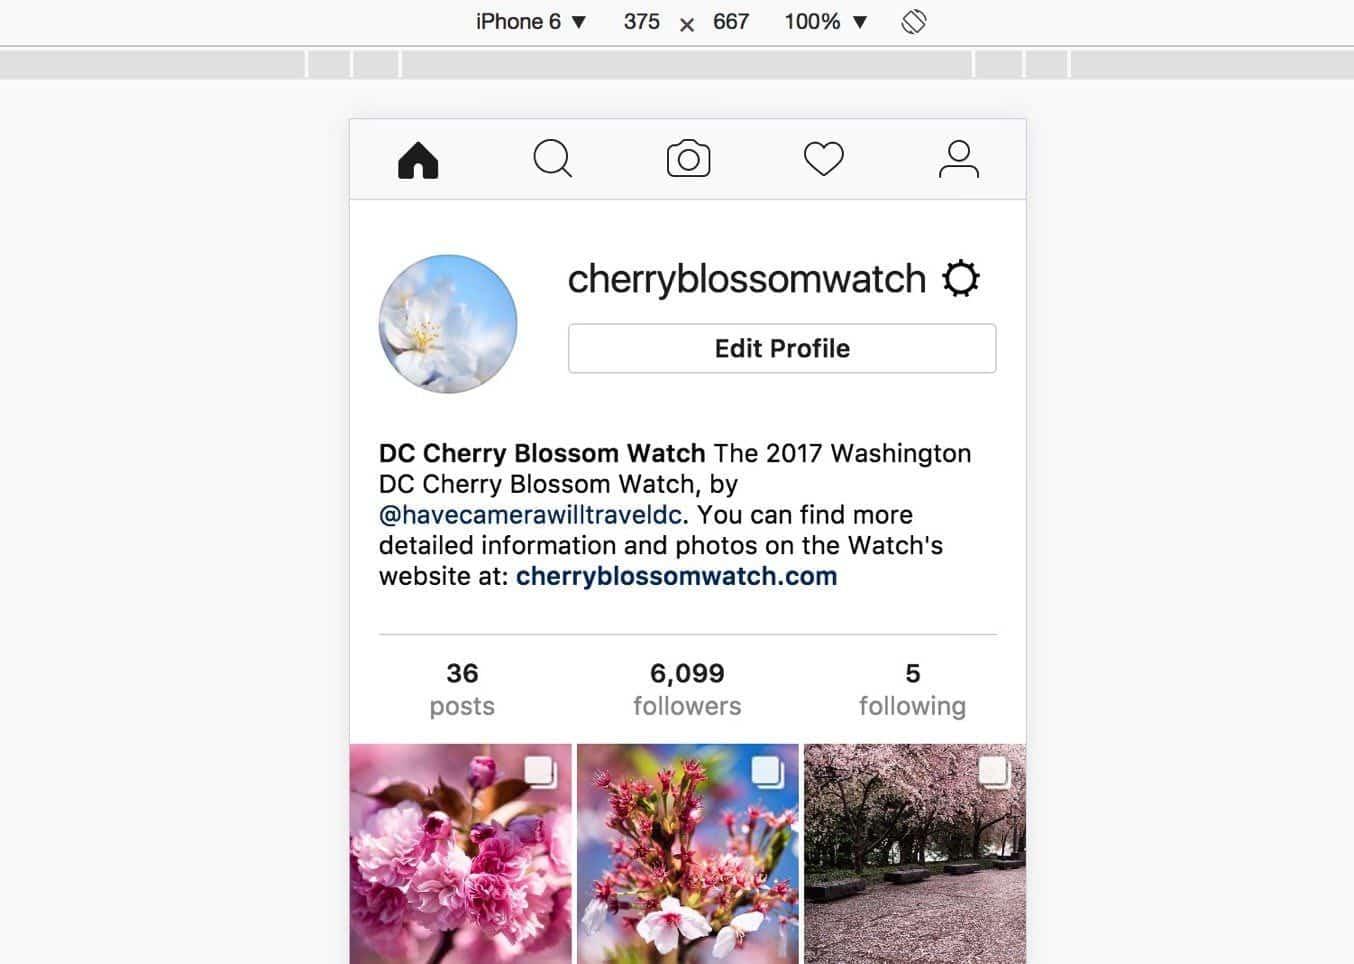 Instagram User Agent Upload